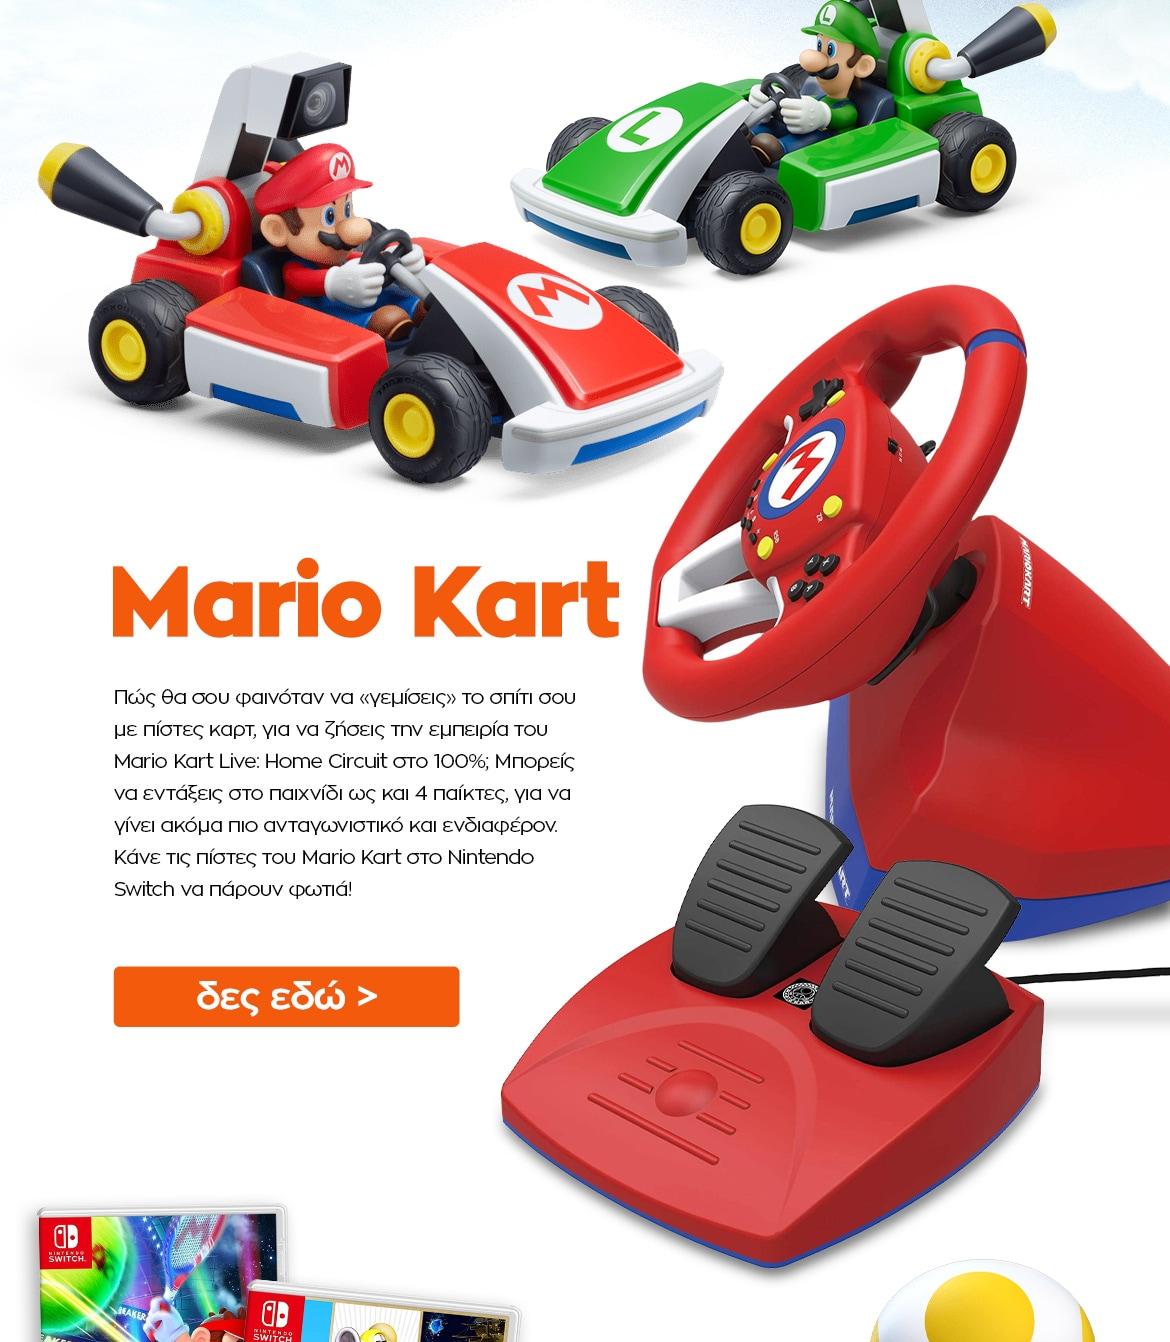 Mario kart Live